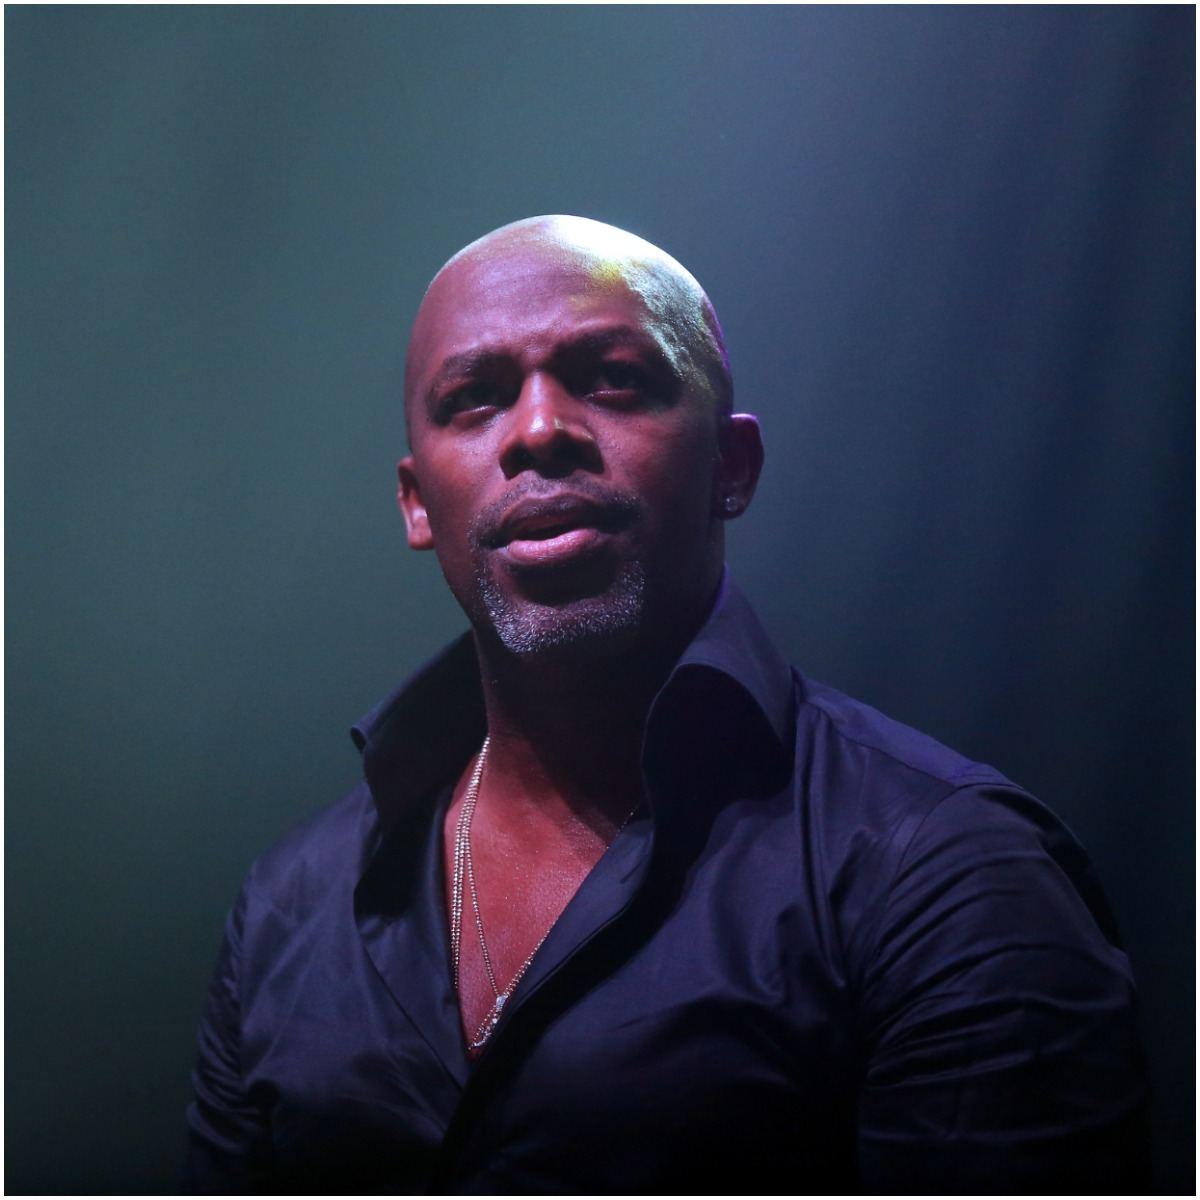 what is the net worth of Joseph Lewis Thomas (Joe singer)